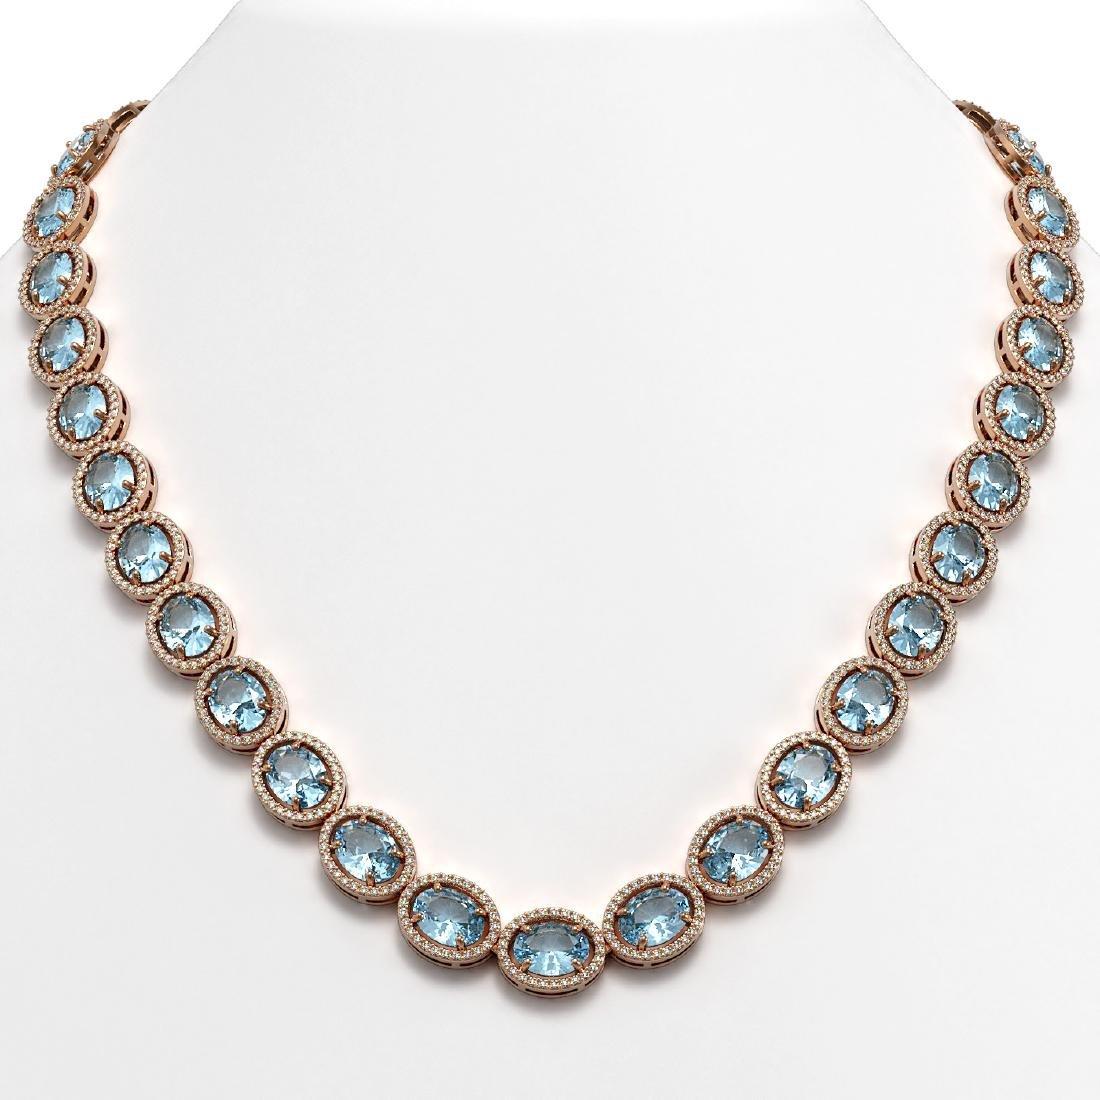 68.17 CTW Sky Topaz & Diamond Halo Necklace 10K Rose